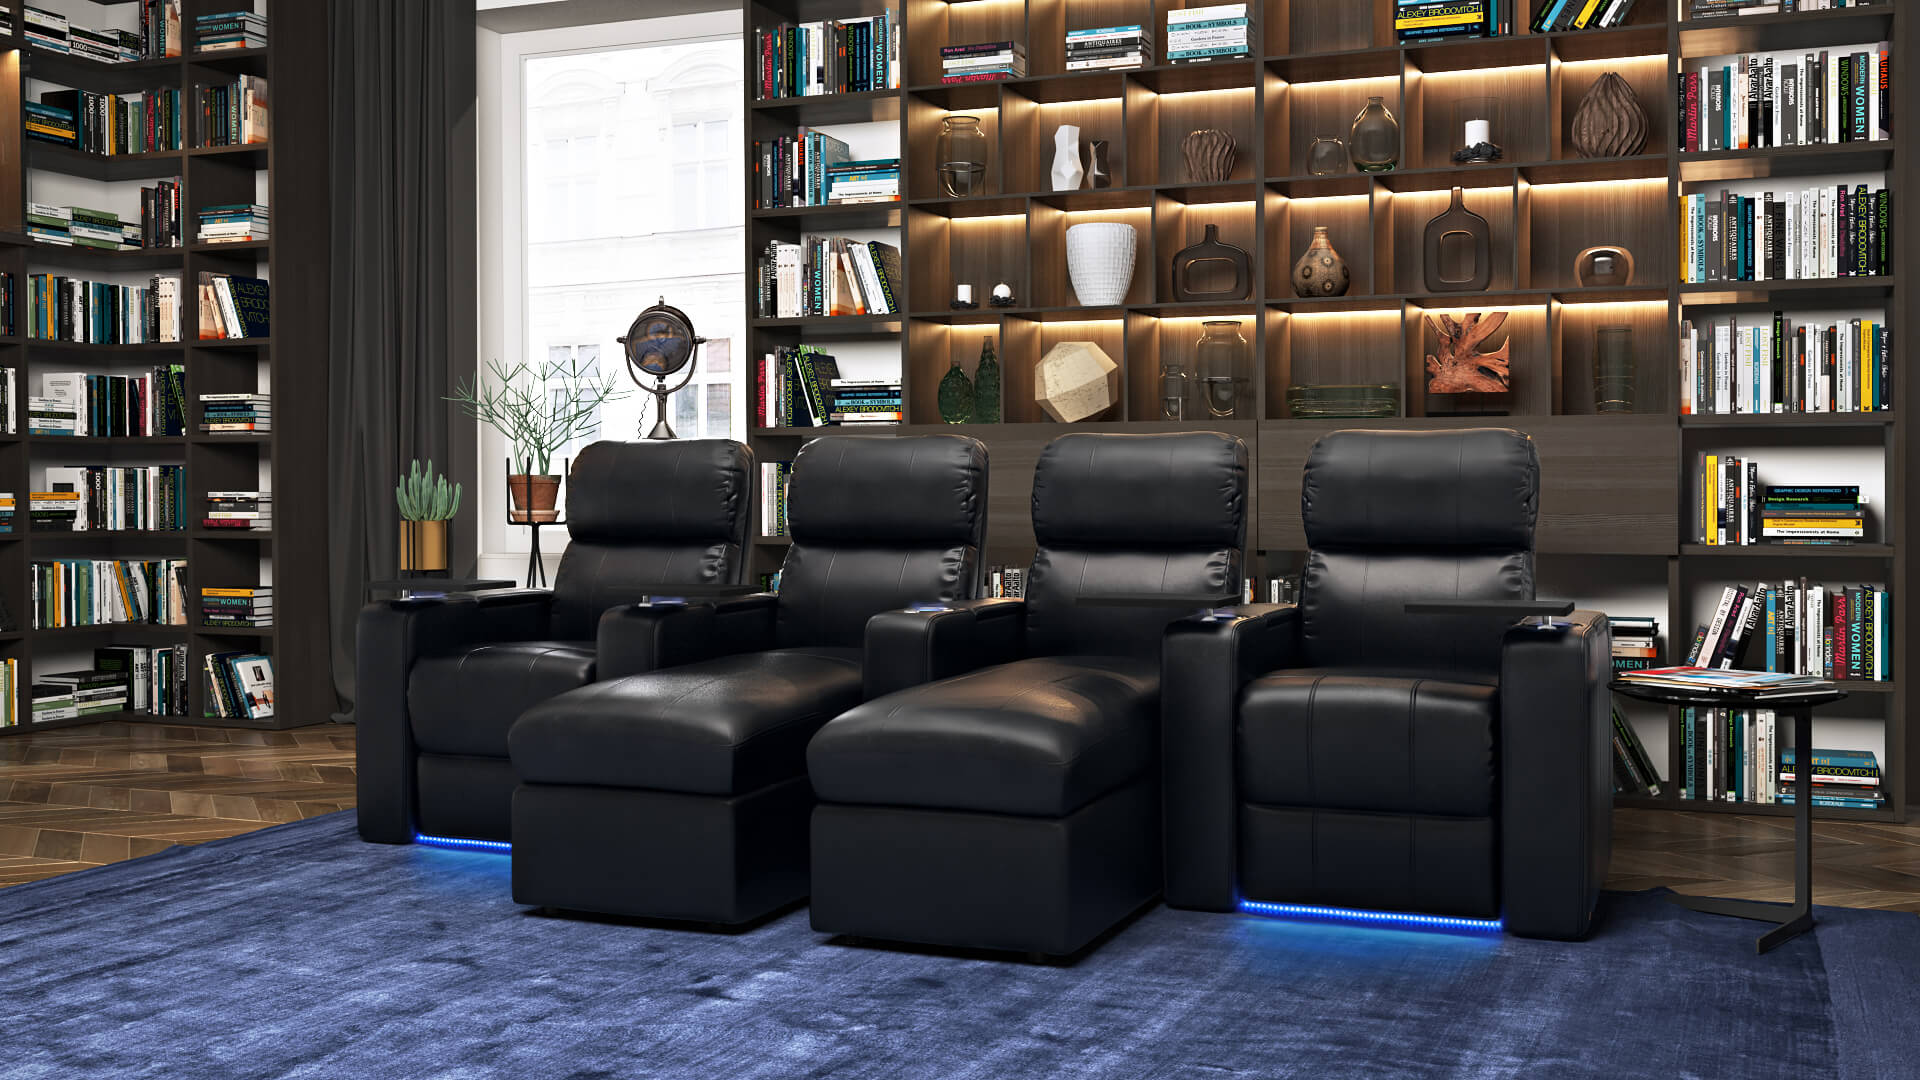 Product CG Render for Modular Sofa